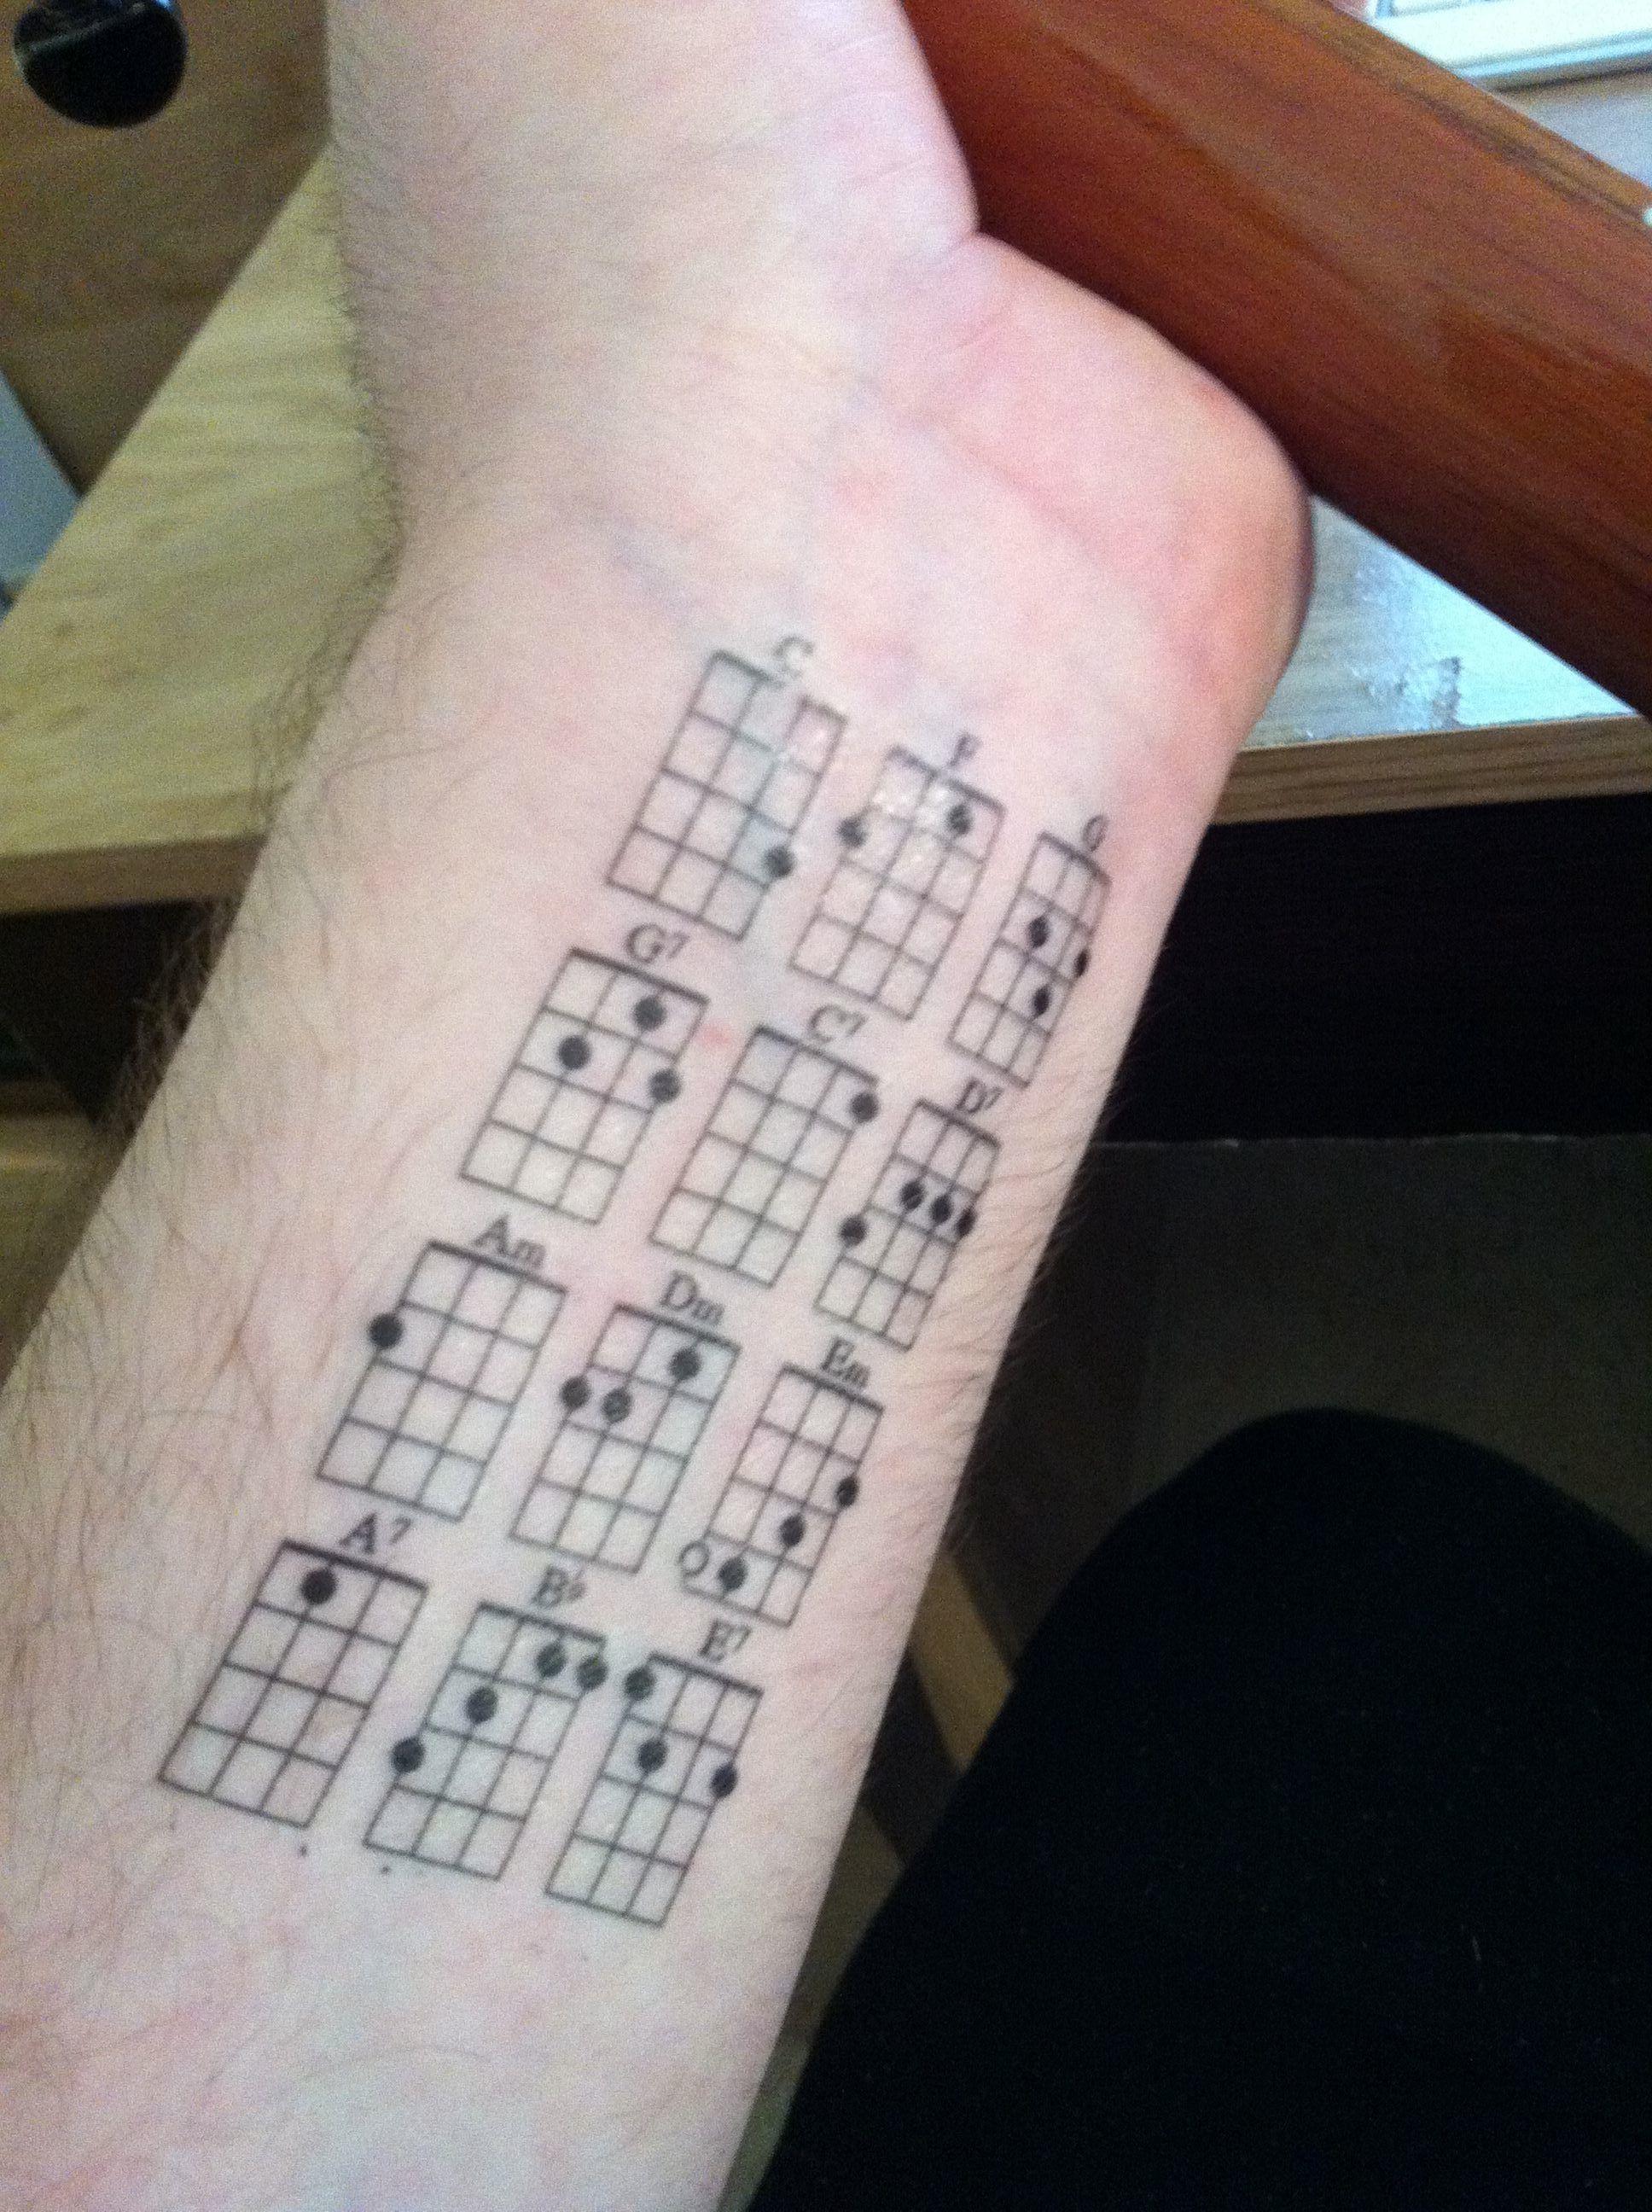 Tattoo Tattoo Fail Friday Links (With images) Tattoo